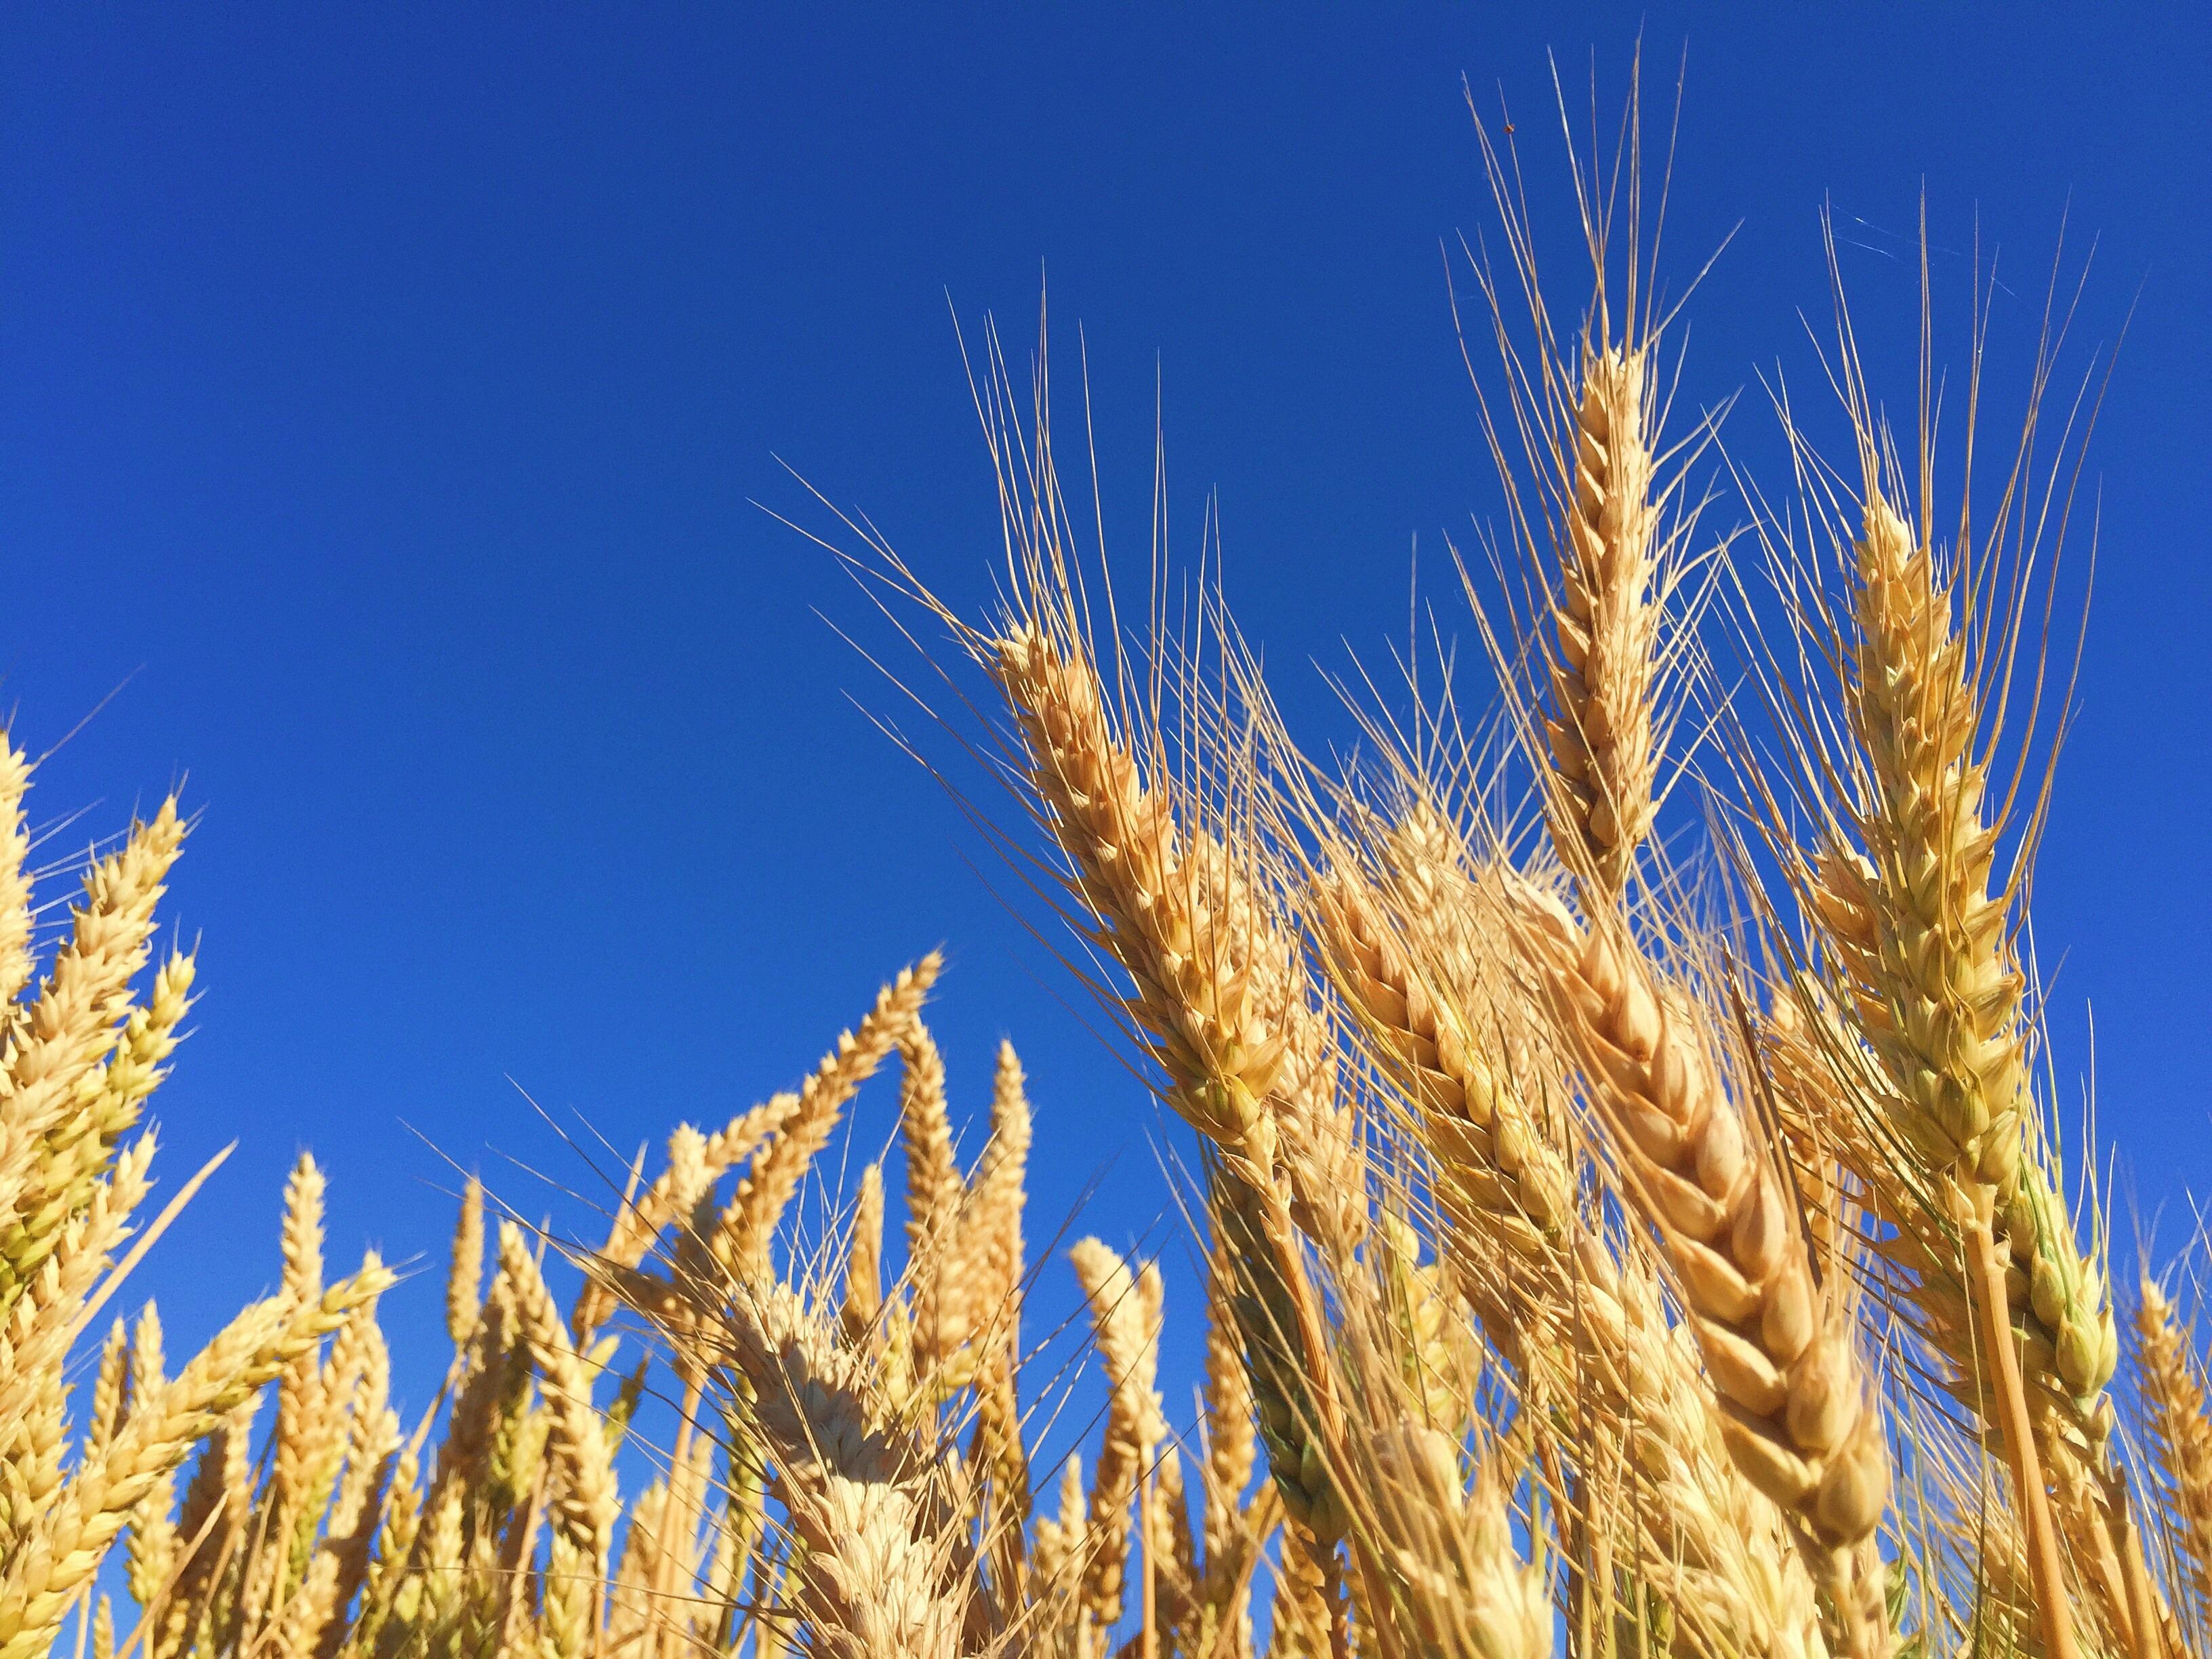 Free Images : sky, field, barley, prairie, crop, agriculture